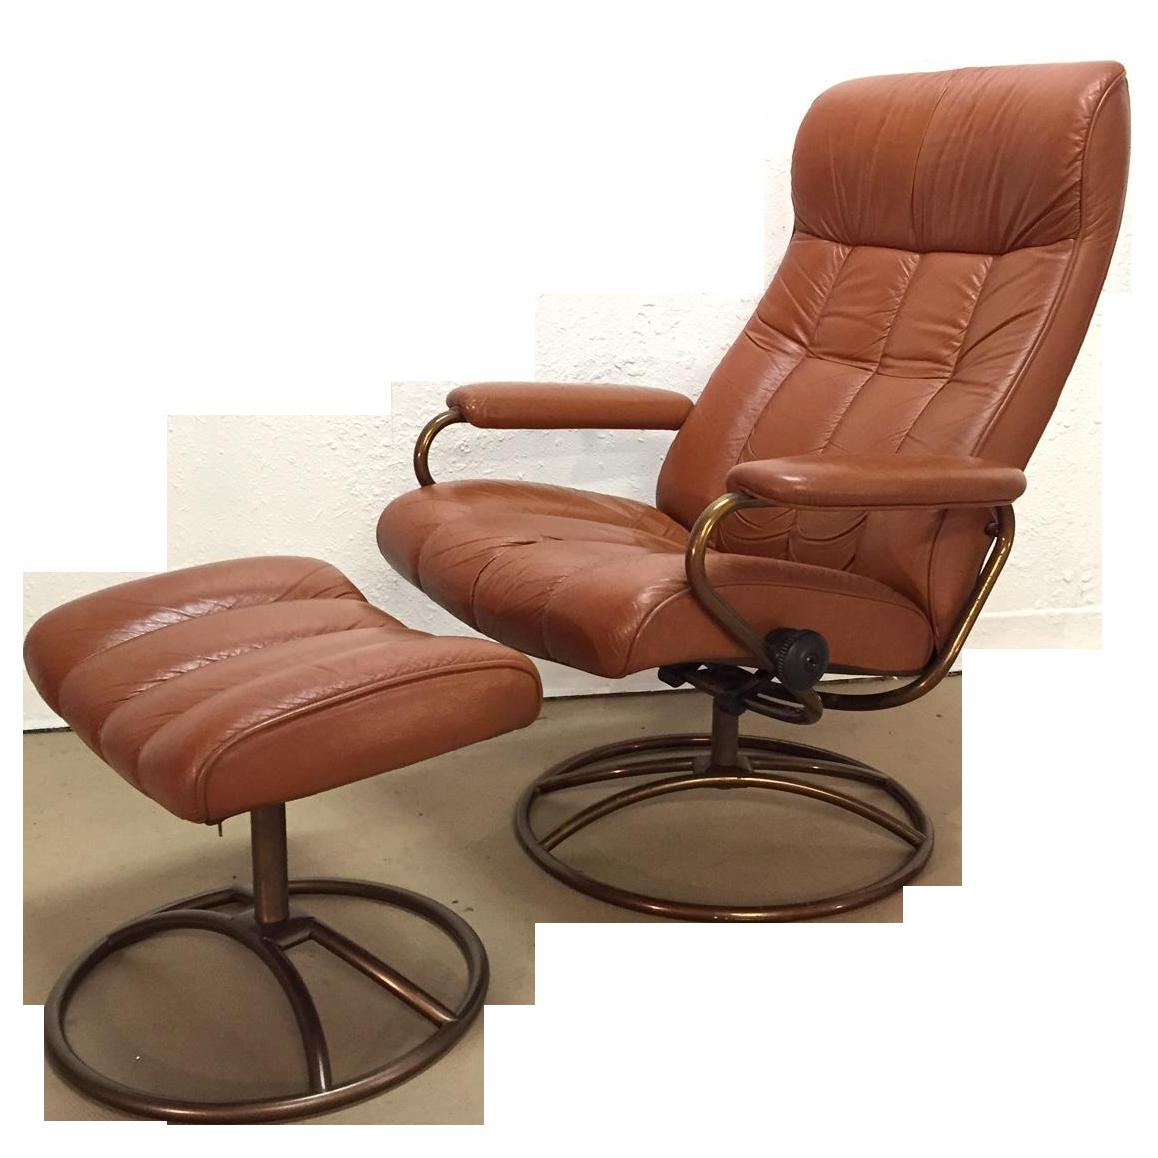 Vintage Ekornes Stressless Chair And Ottoman Stressless Chair Chair And Ottoman Set Chair